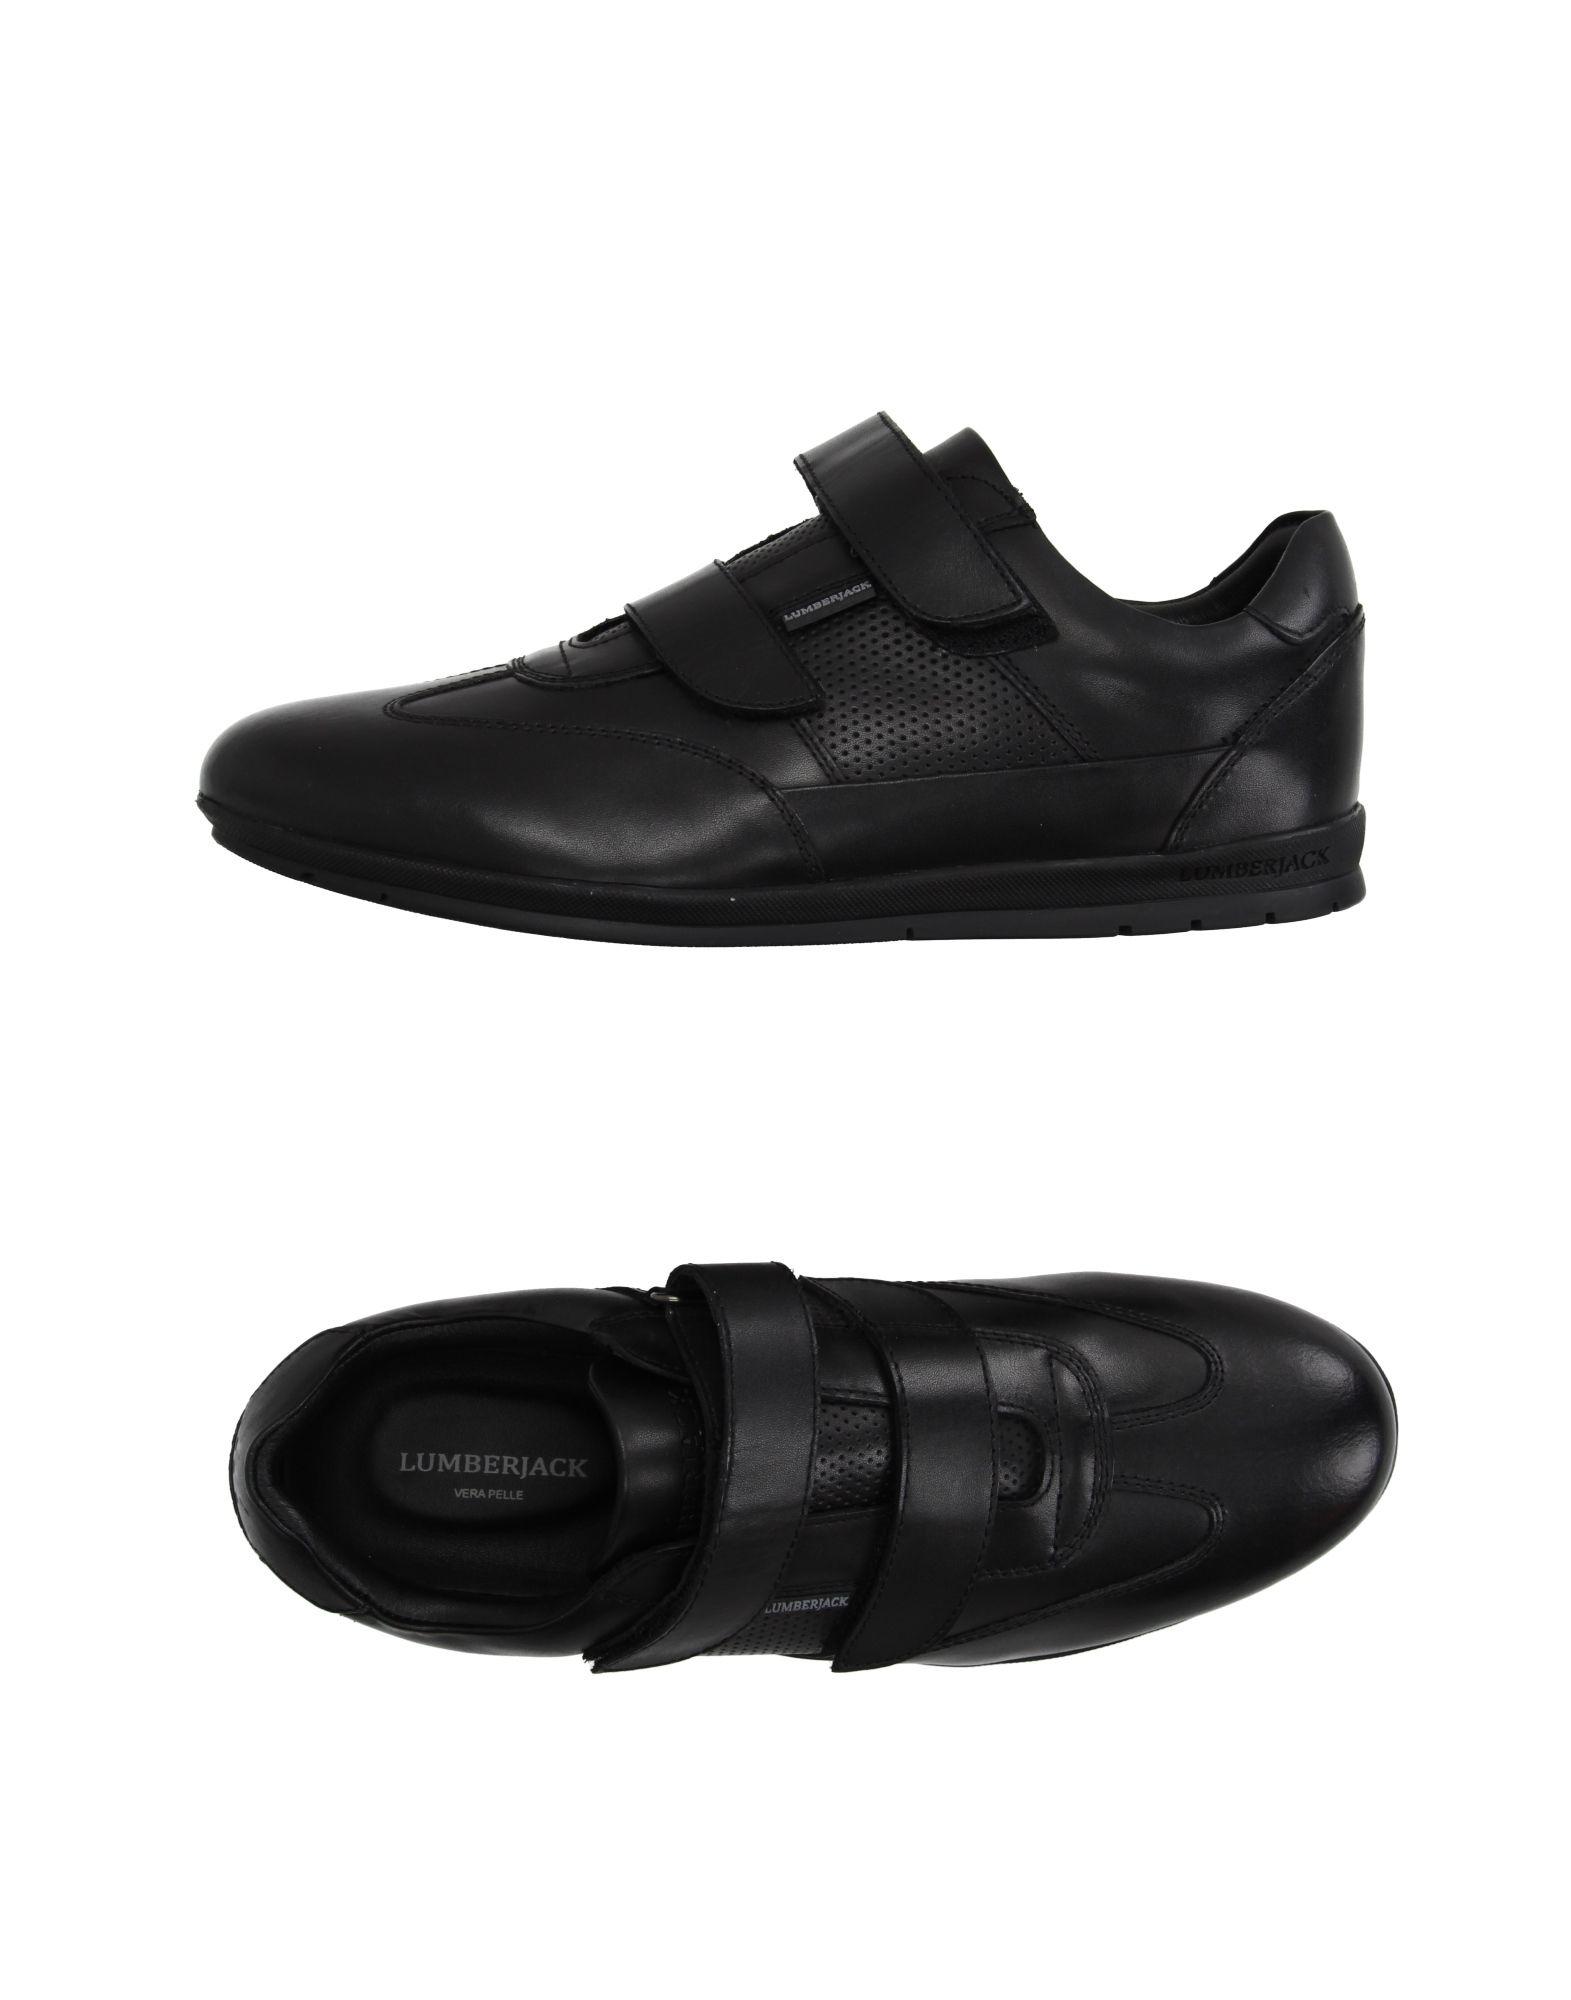 LUMBERJACK Herren Low Sneakers & Tennisschuhe Farbe Schwarz Größe 7 jetztbilligerkaufen